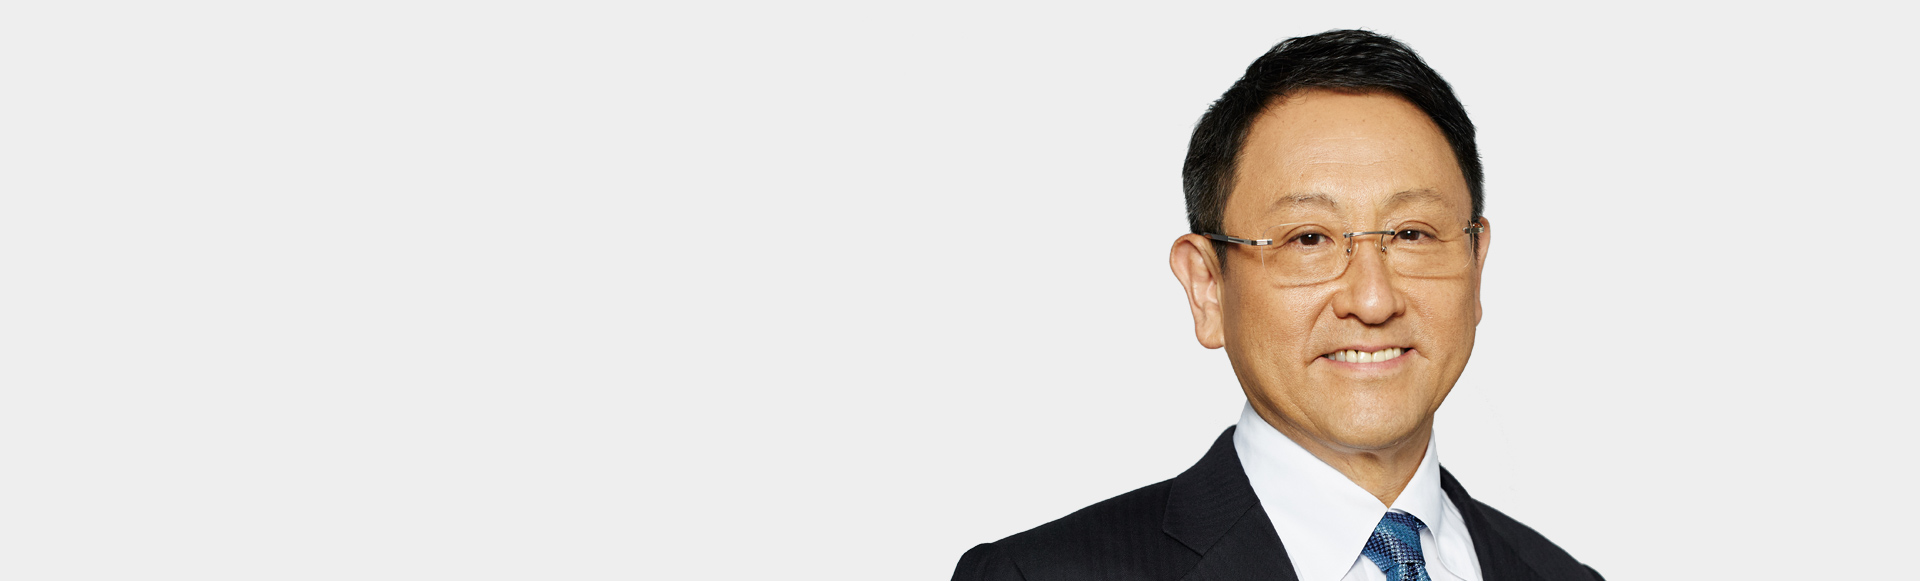 Akio Toyoda, President, Member of the Board of Directors | CORPORATE